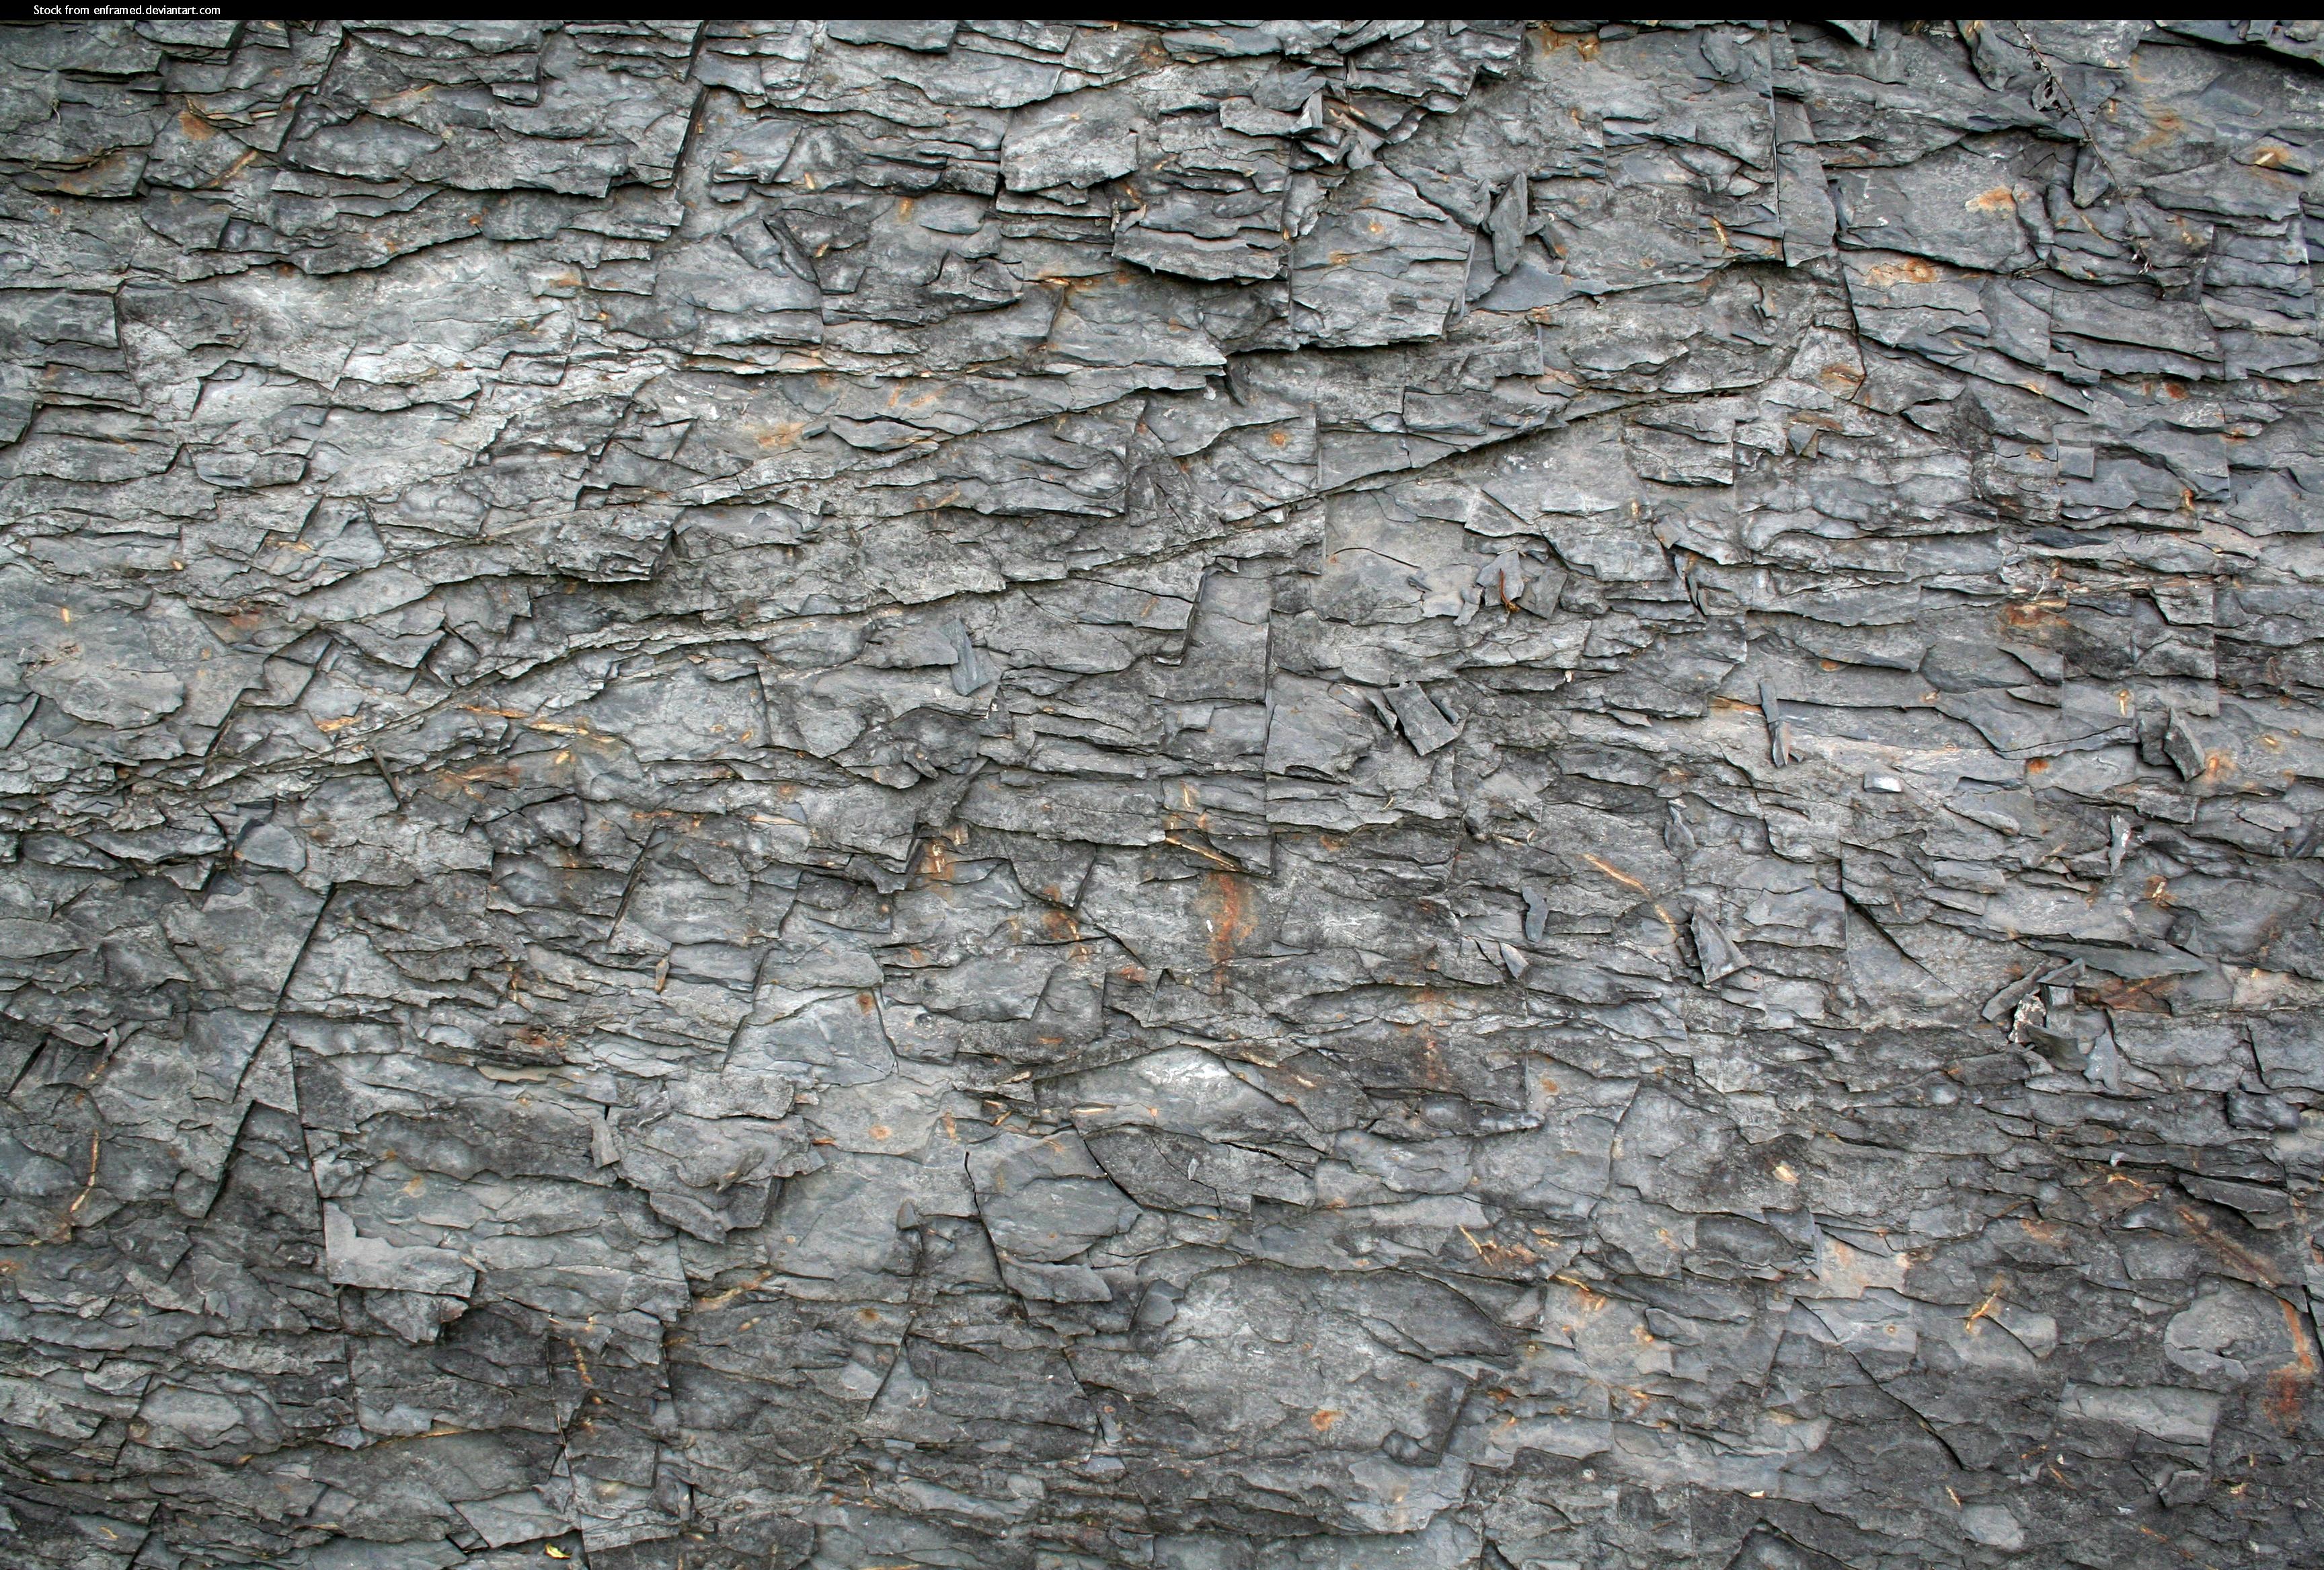 stone texture l1 by enframed watch scraps 2005 2015 enframed stone 3456x2334